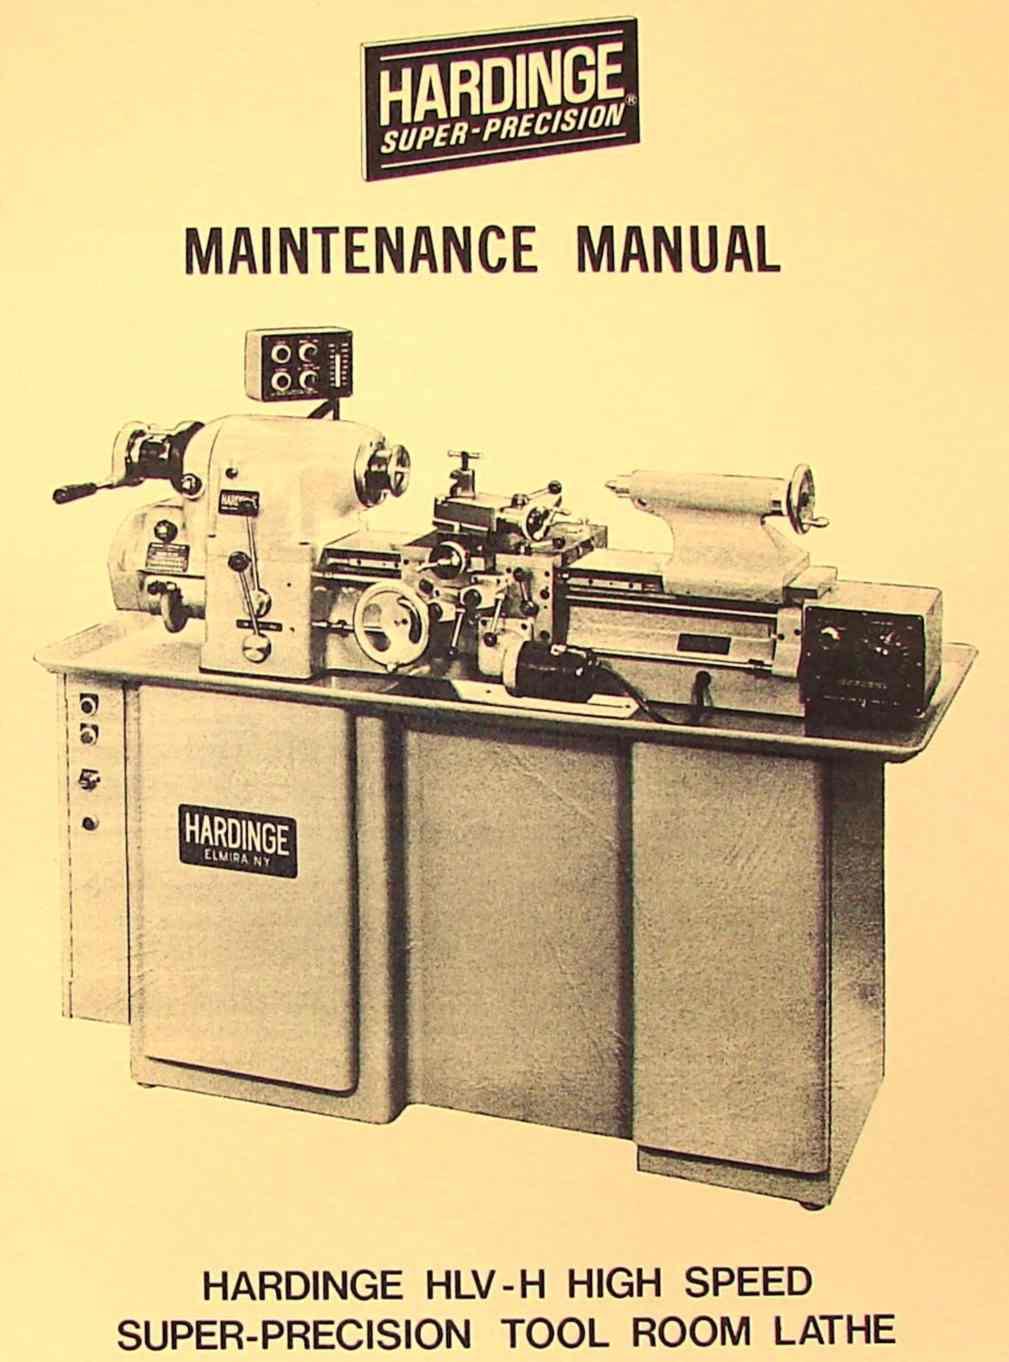 hardinge hlv h metal lathe maintenance manual ozark tool manuals rh ozarktoolmanuals com hardinge lathe parts list hardinge manual lathe for sale